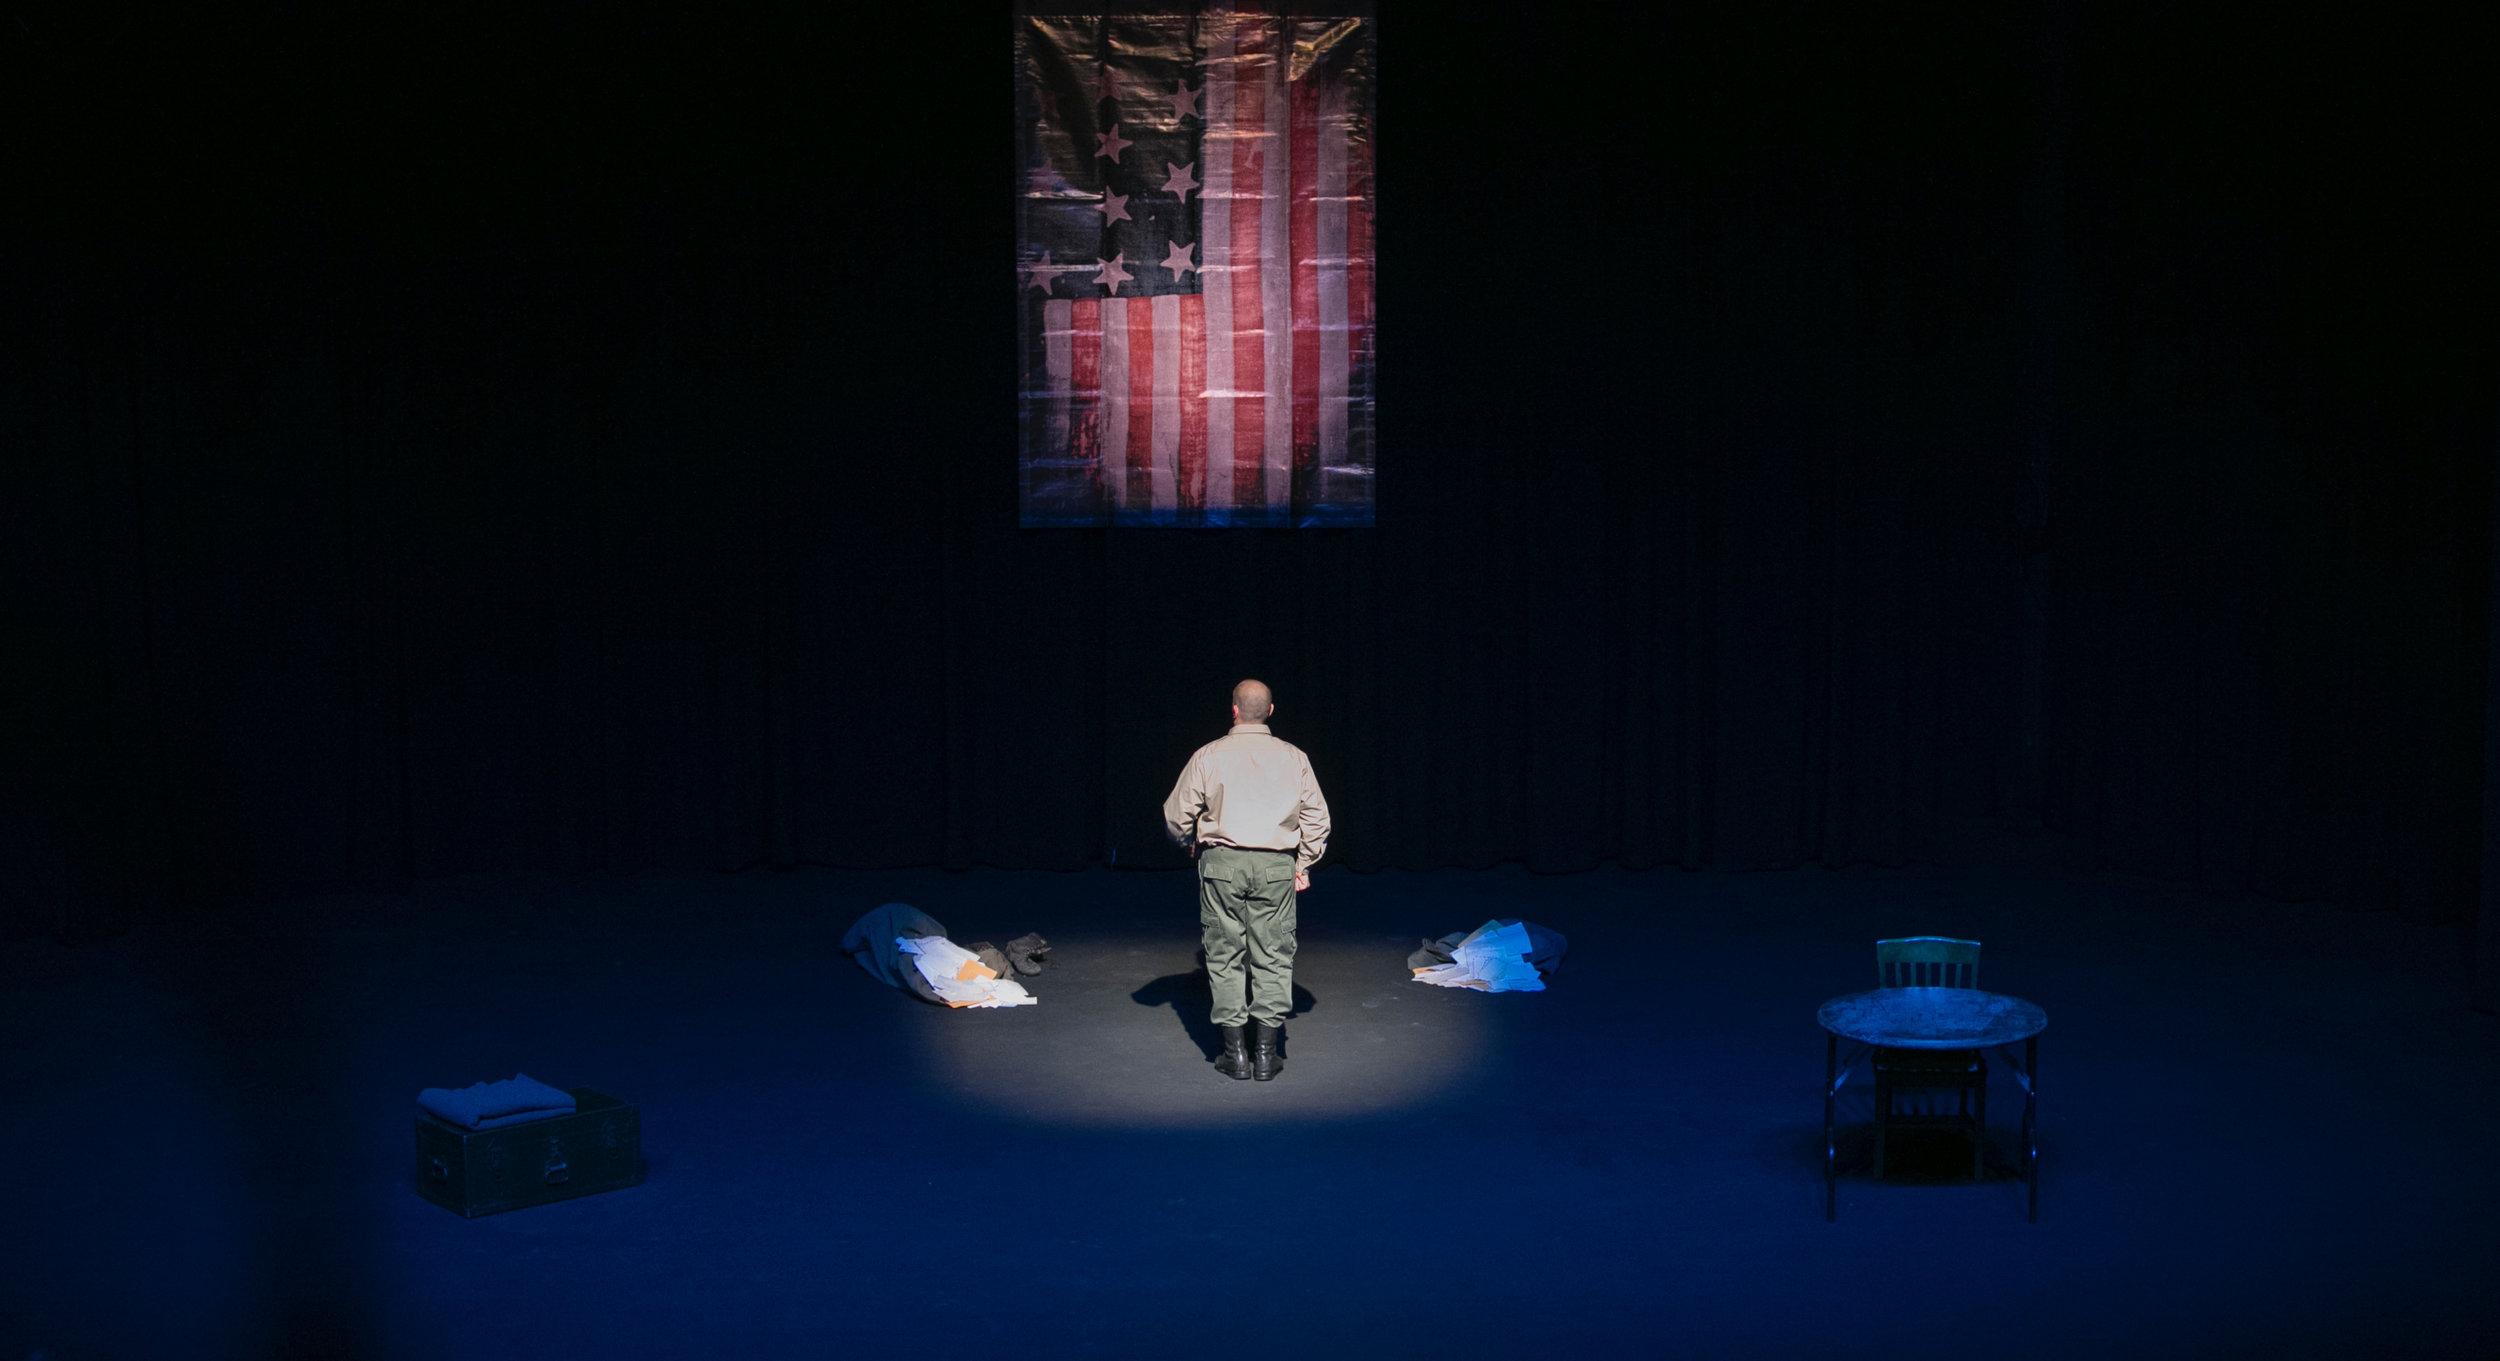 The_American_Soldier_20181005_TColella_HR_03.jpg